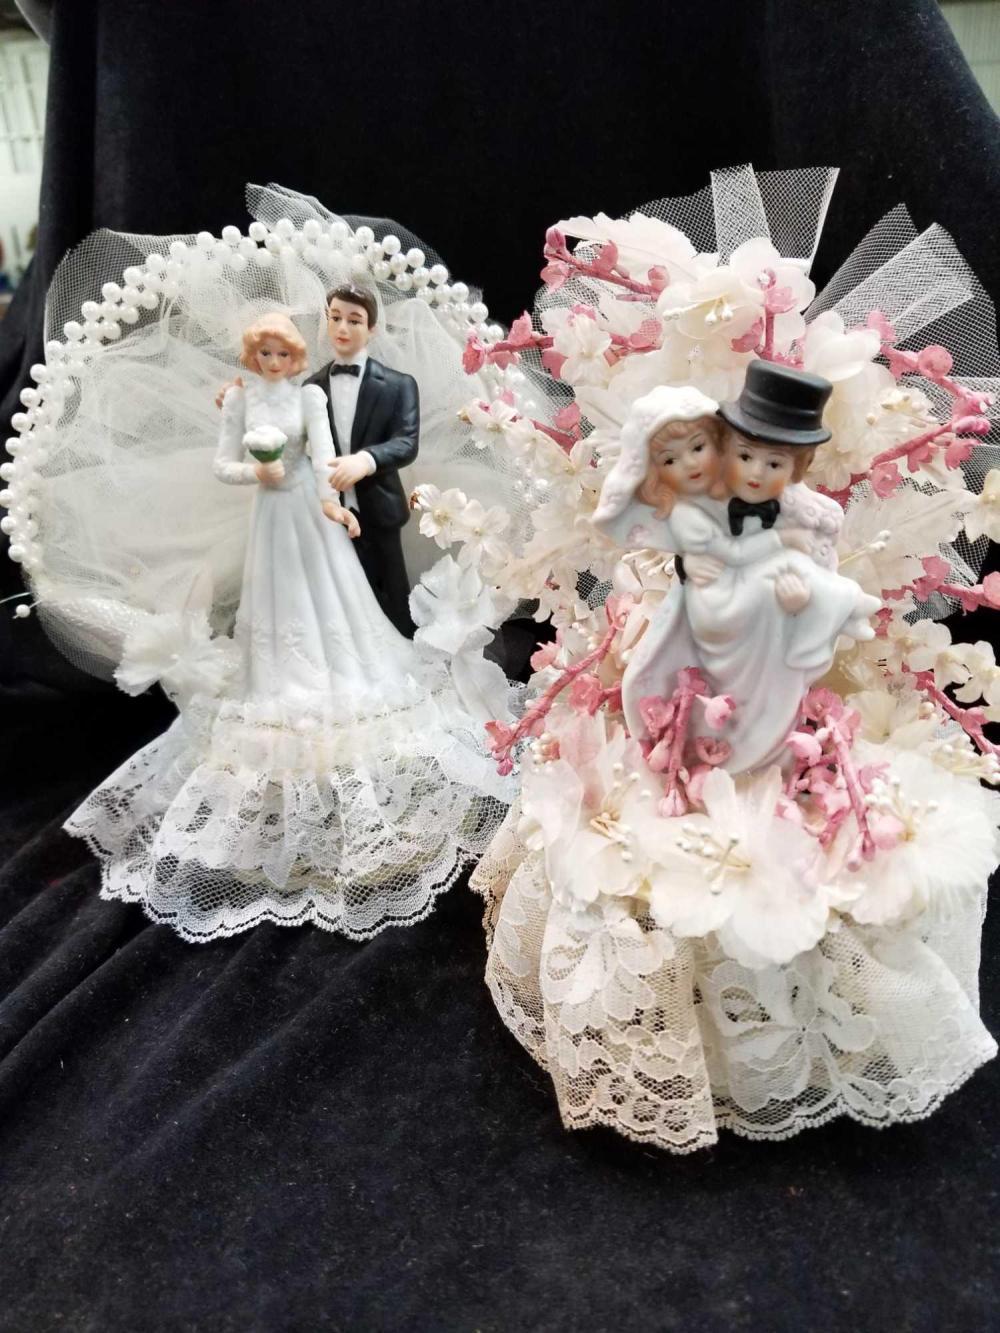 VINTAGE PORCELAIN WEDDING CAKE TOPPERS - 2 ITEMS